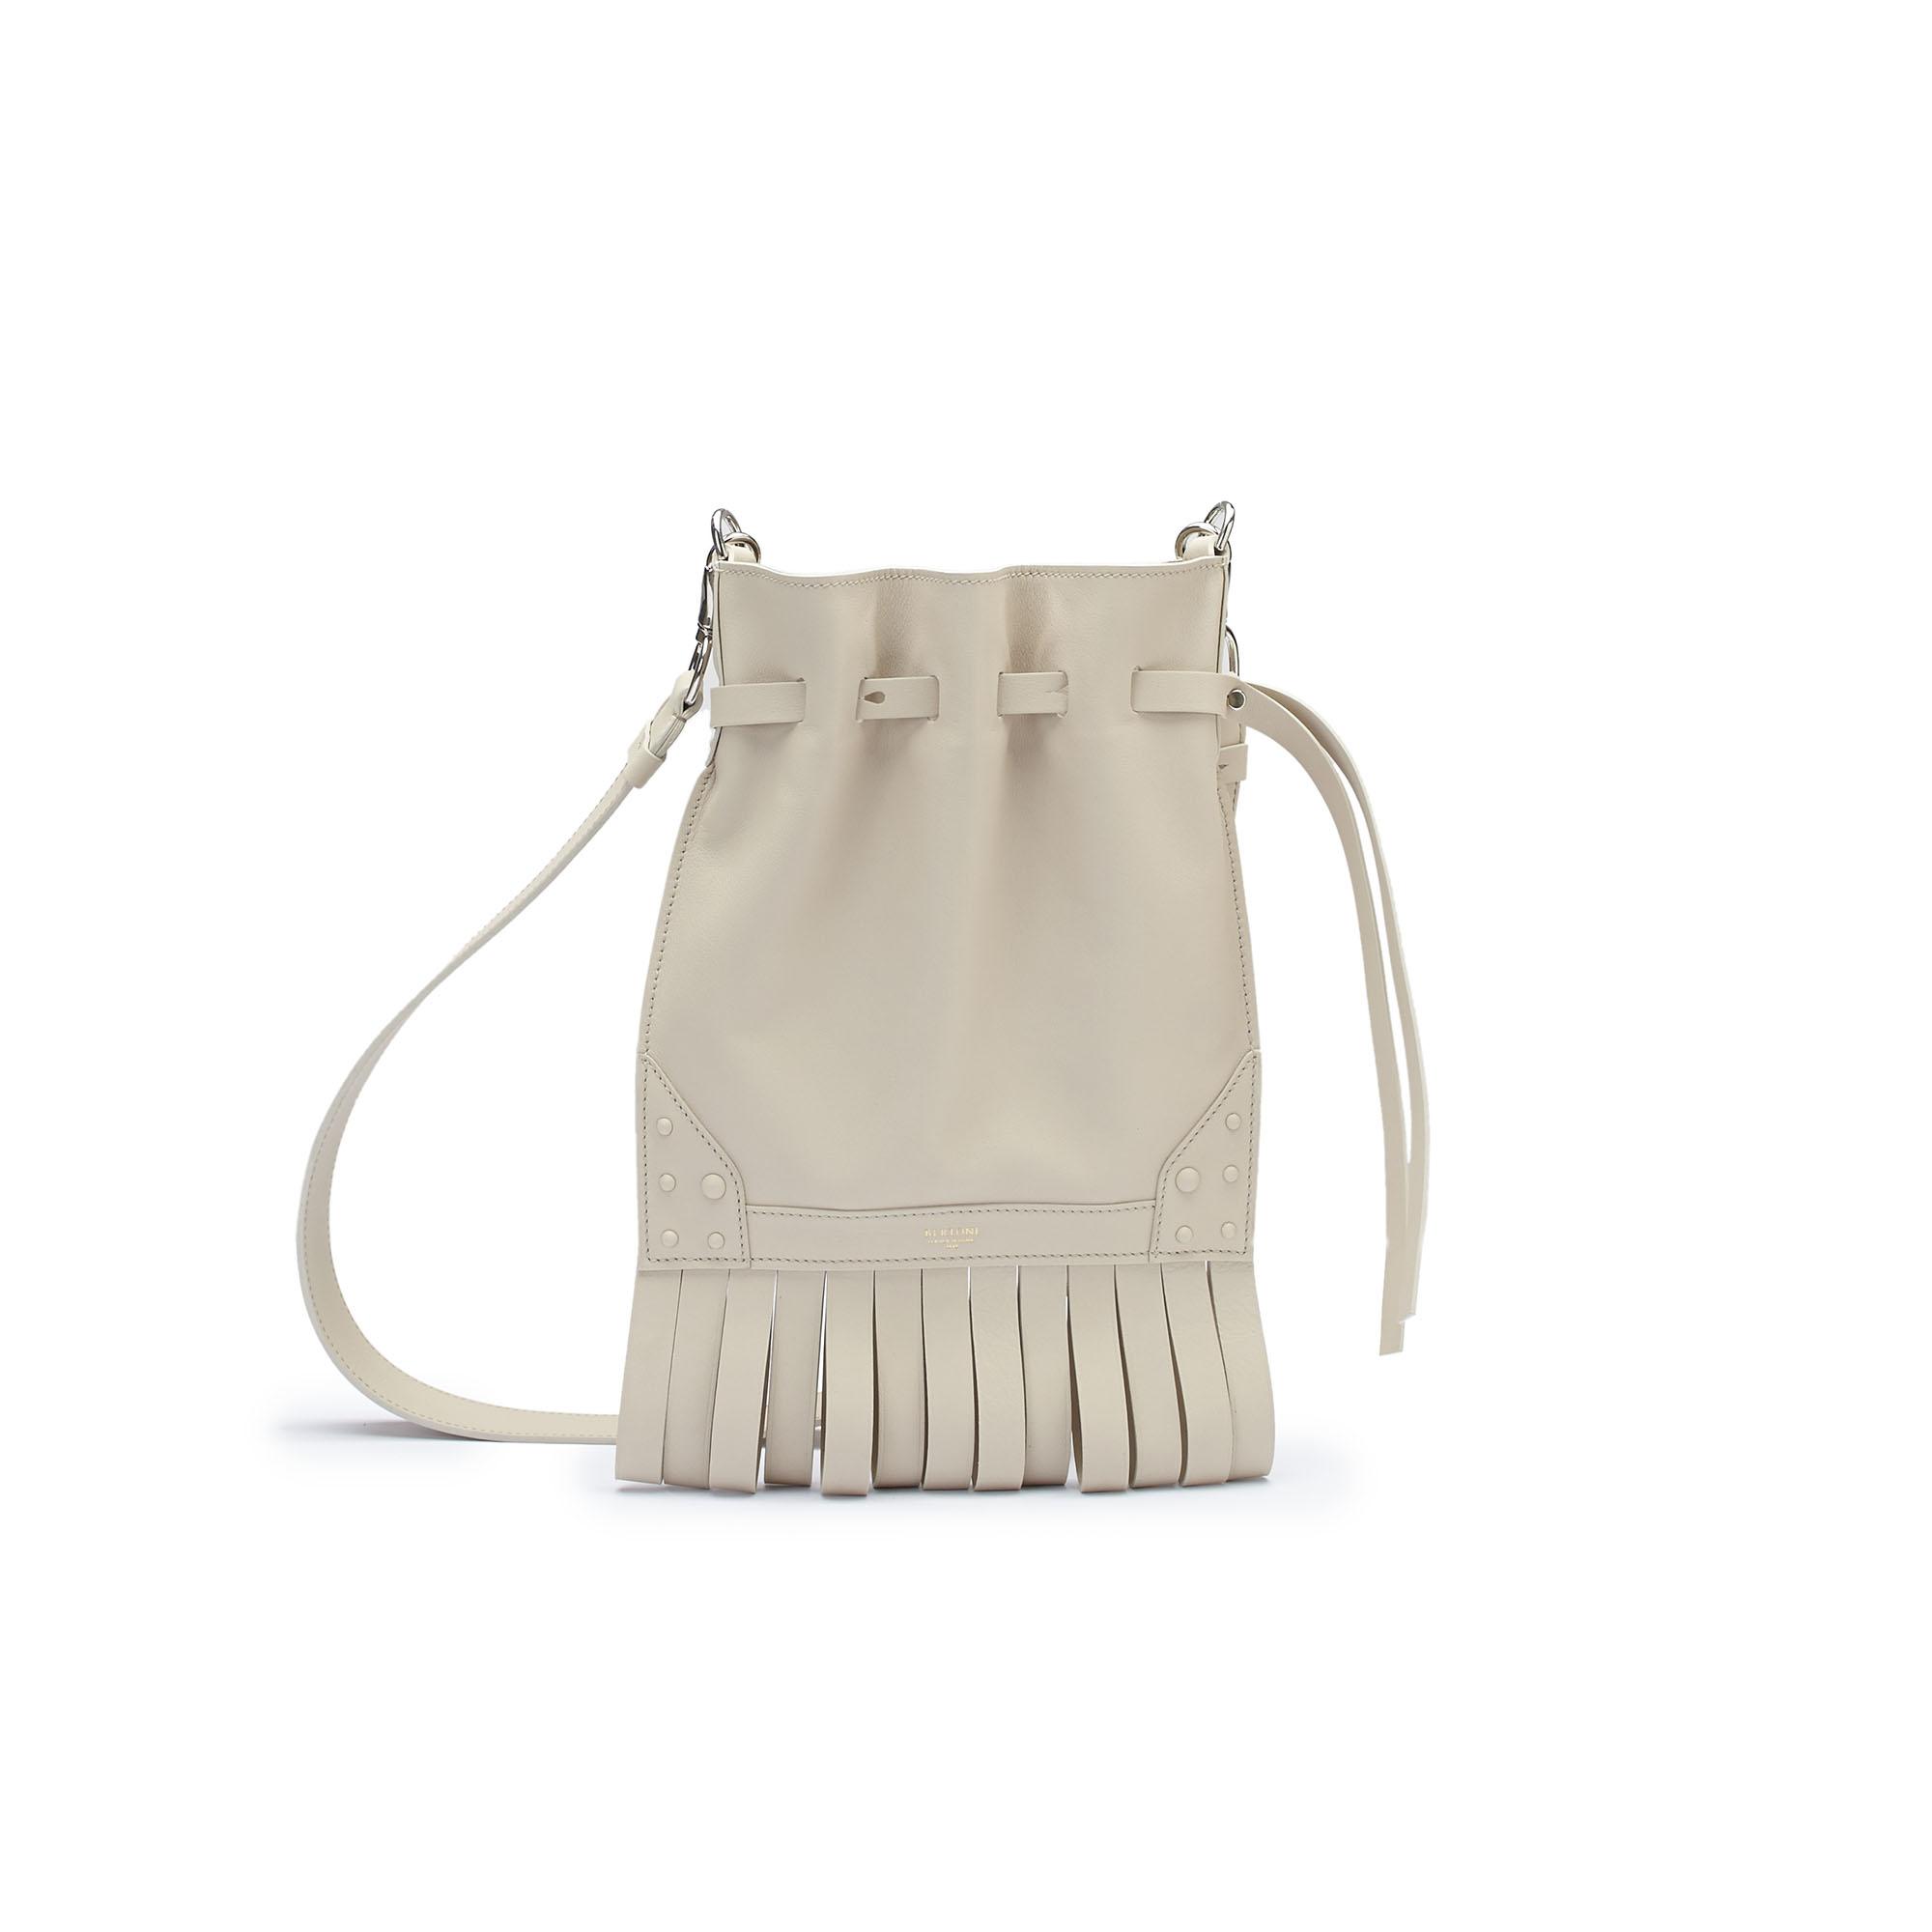 The Ivory soft calf Fanny Fringe bag by Bertoni 1949 01